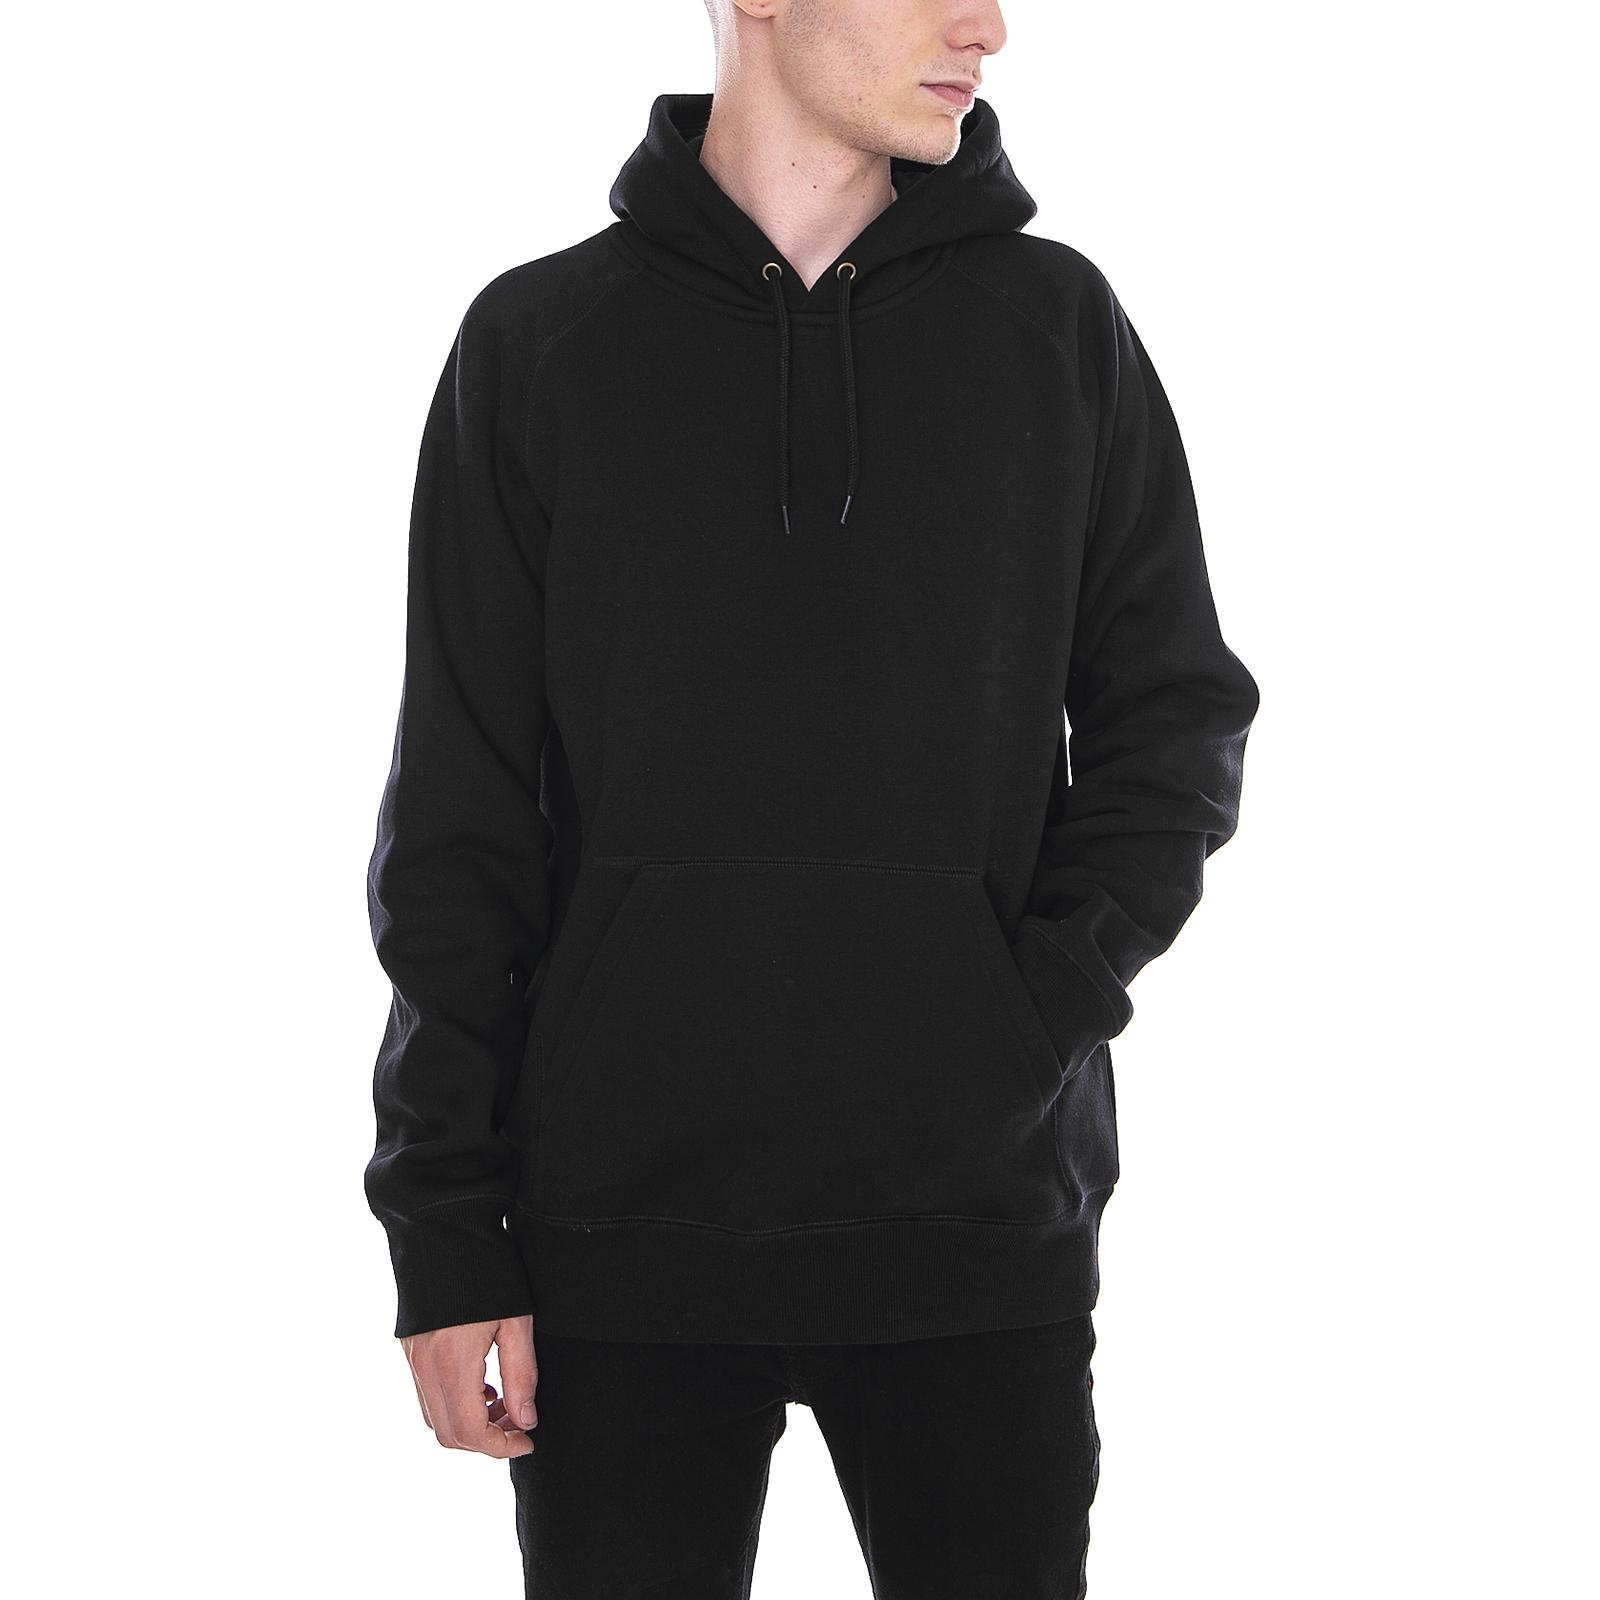 Carhartt Felpe Hooded Chase Sweatshirt Black / Gold Nero